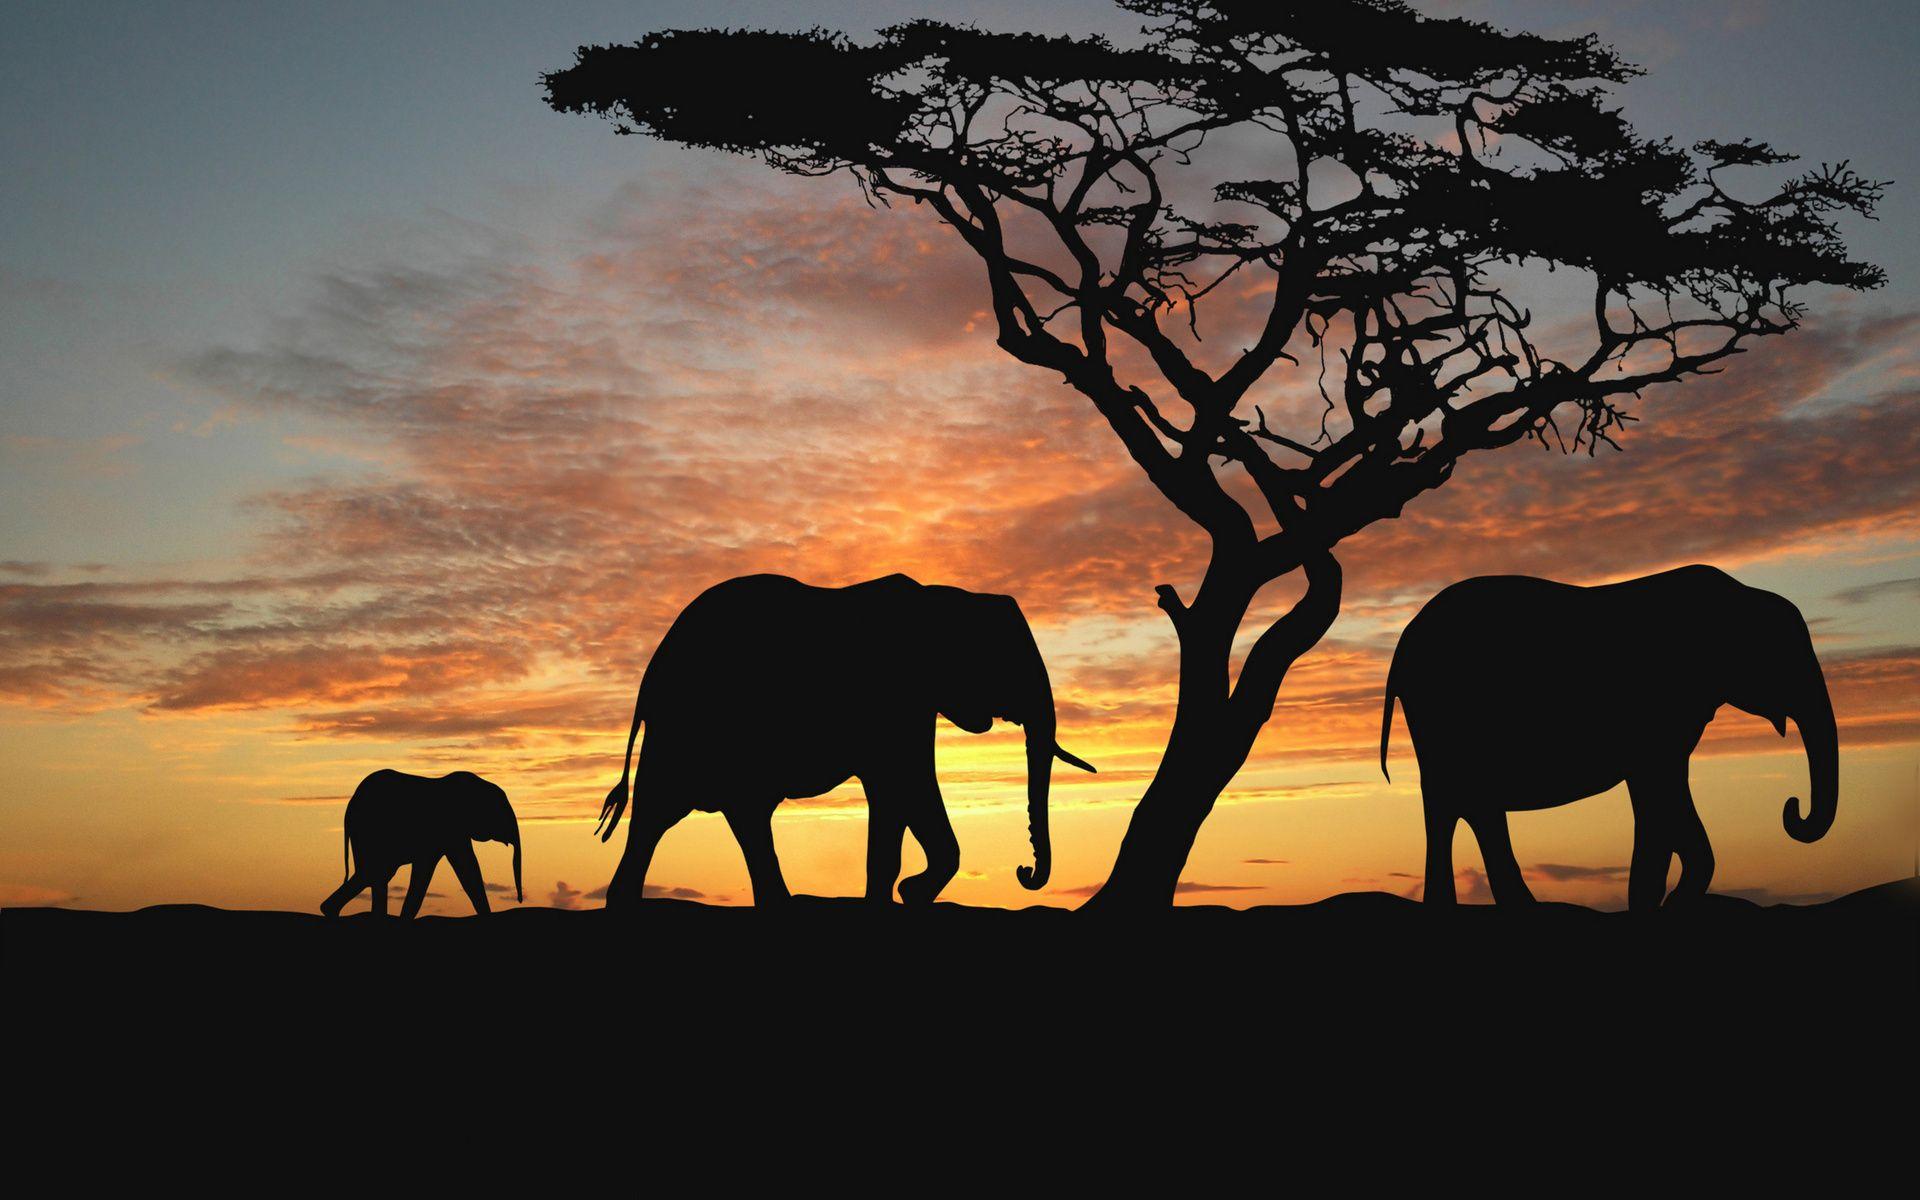 Elephant Wallpaper Silhouette Tree Sunset Africa Hd Wallpapers Elephant Silhouette Elephant Wallpaper Elephant Iphone Wallpaper